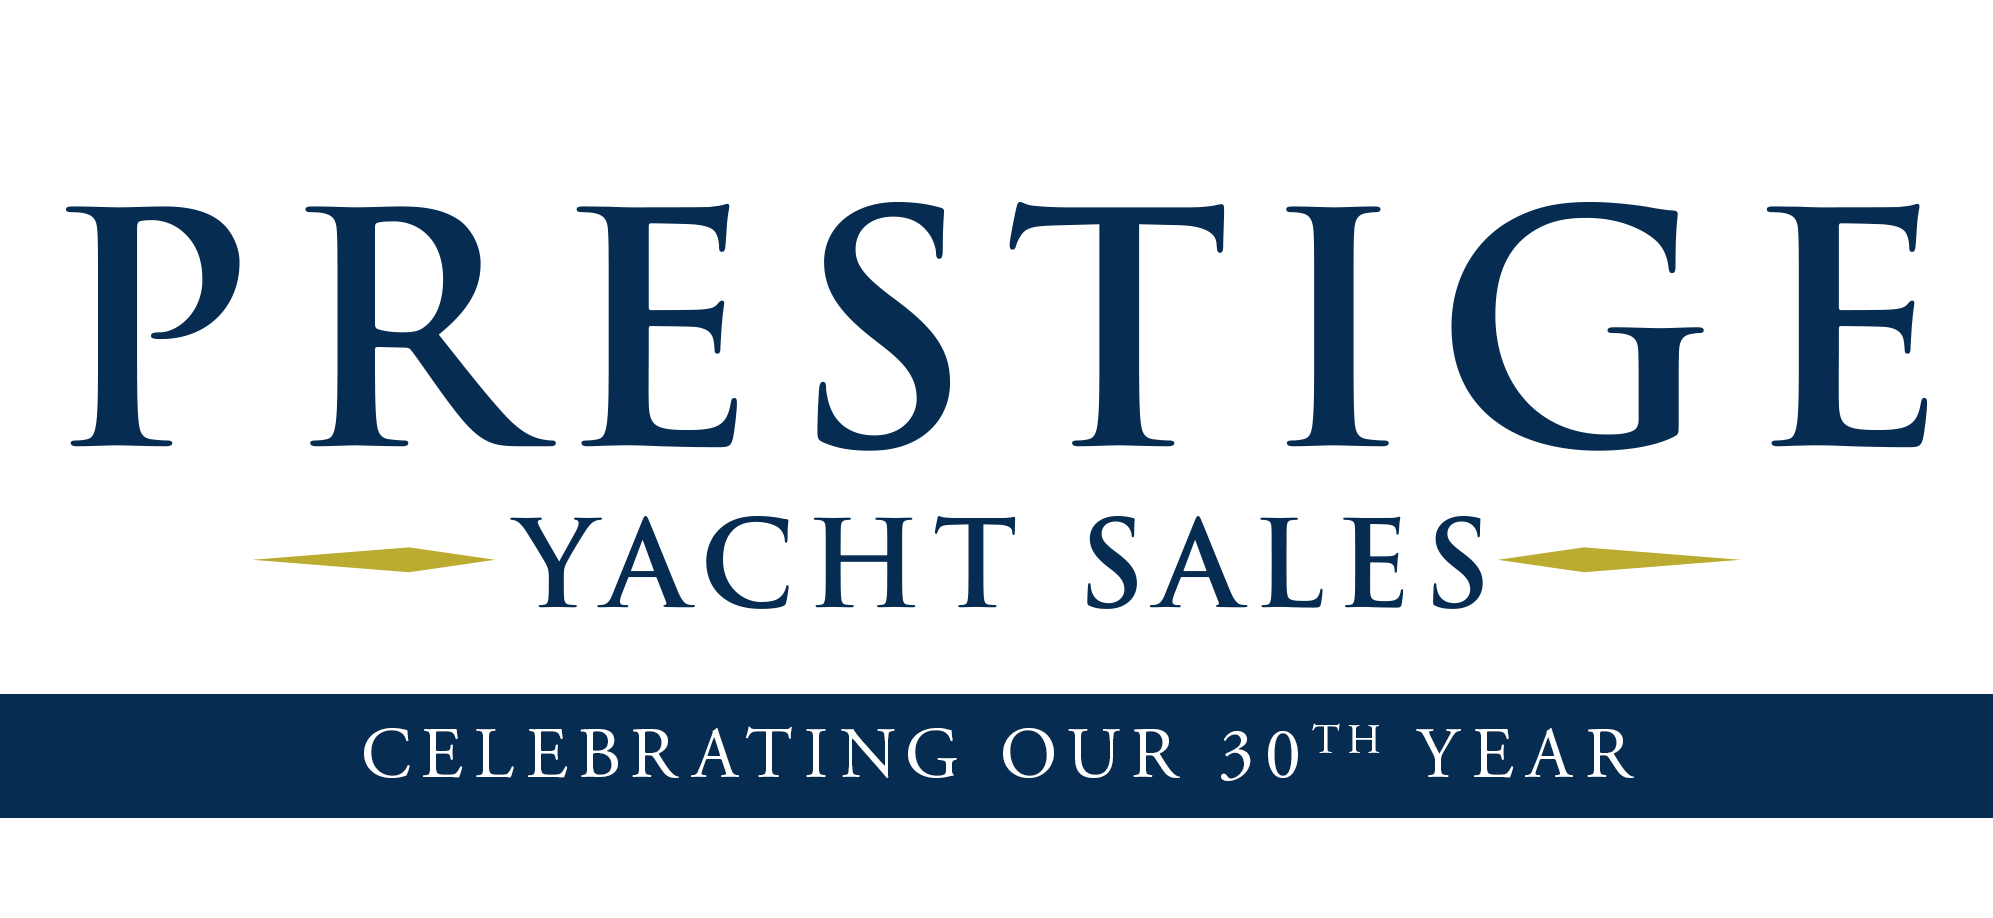 Prestige Yacht Sales - Prestige Yacht Sales - East Greenwich, RI logo